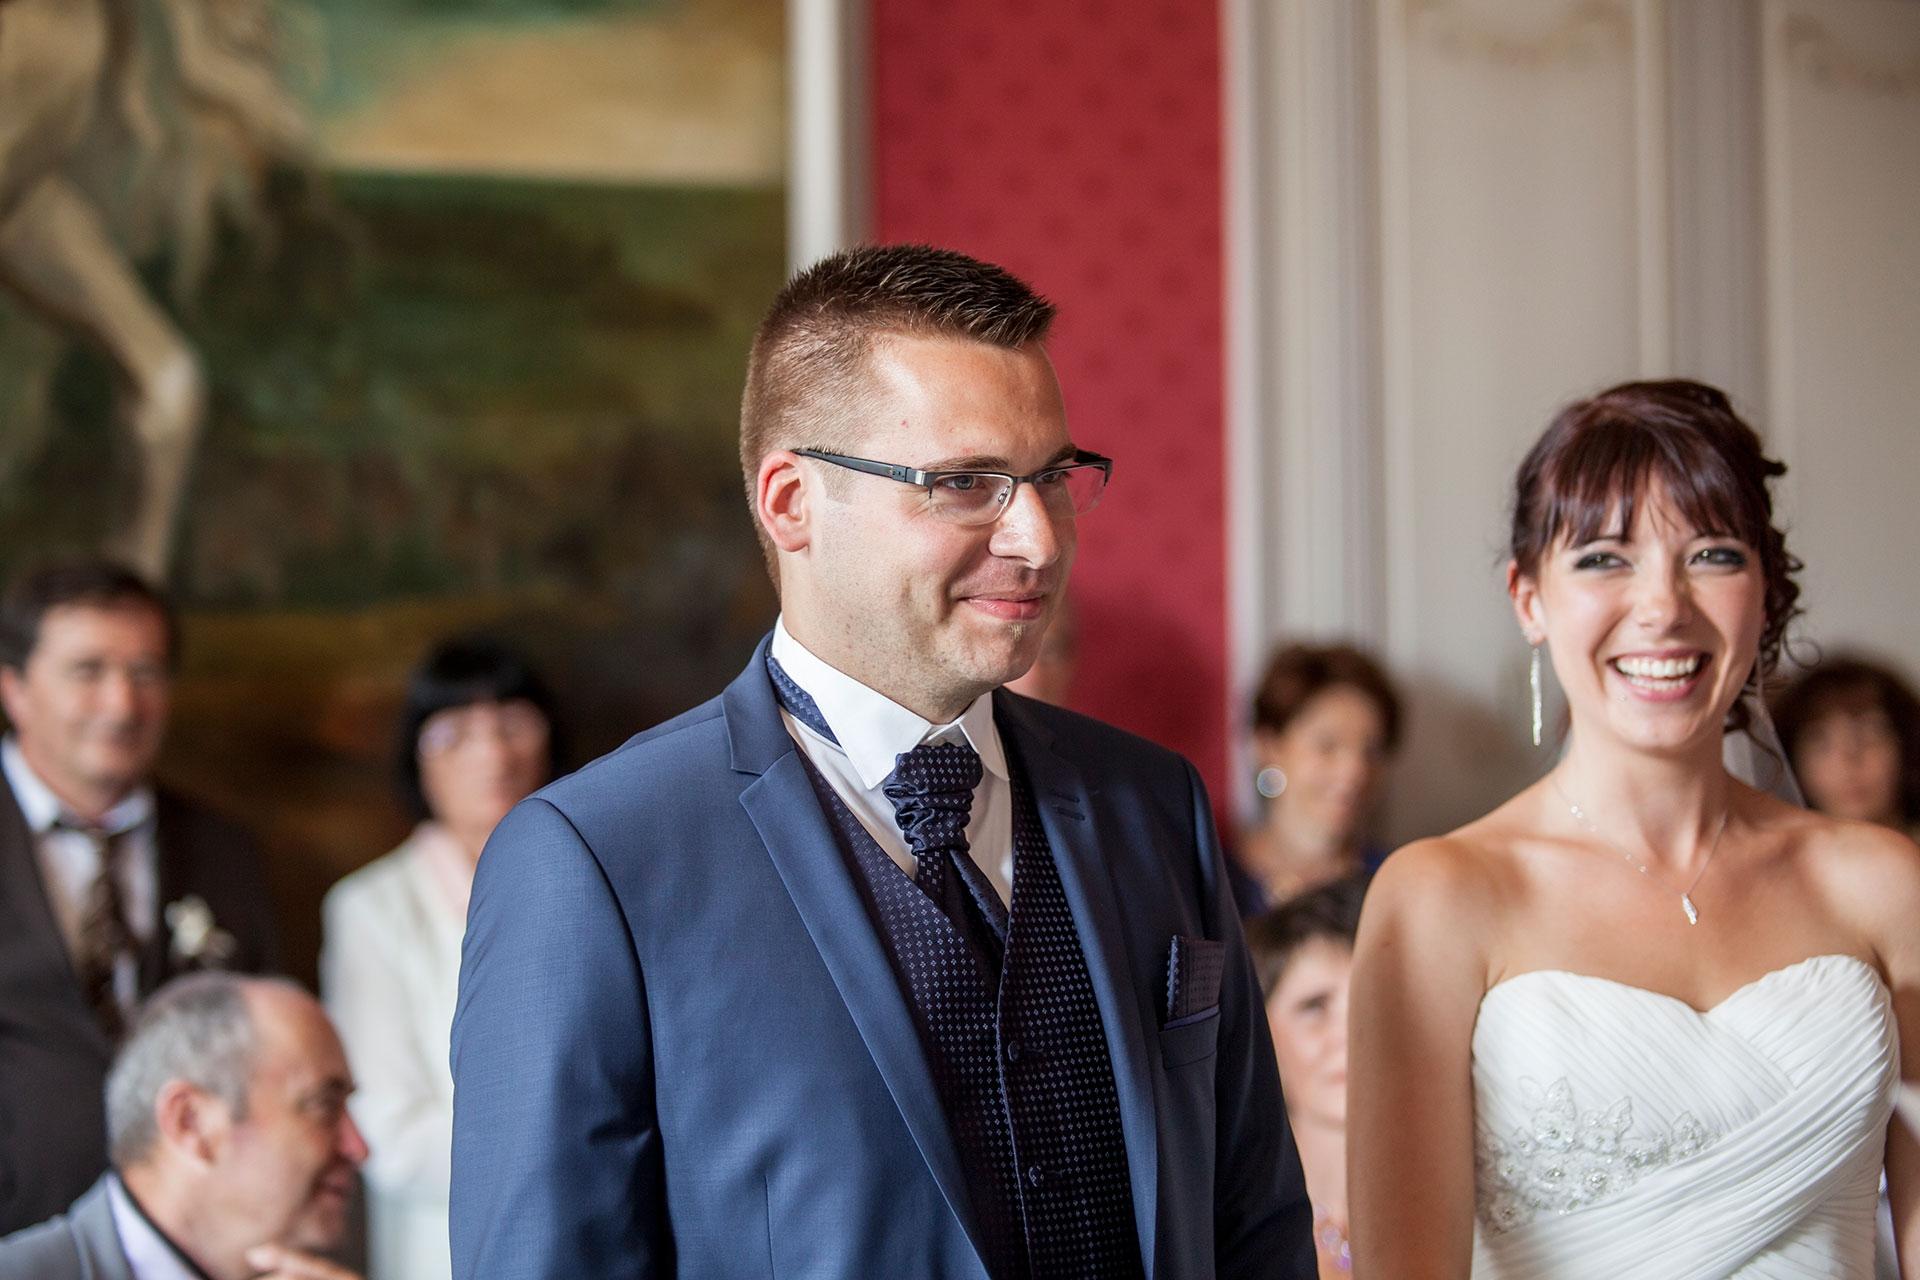 particuliers-evenements-mariages-oui-aurelie&geoffrey-03